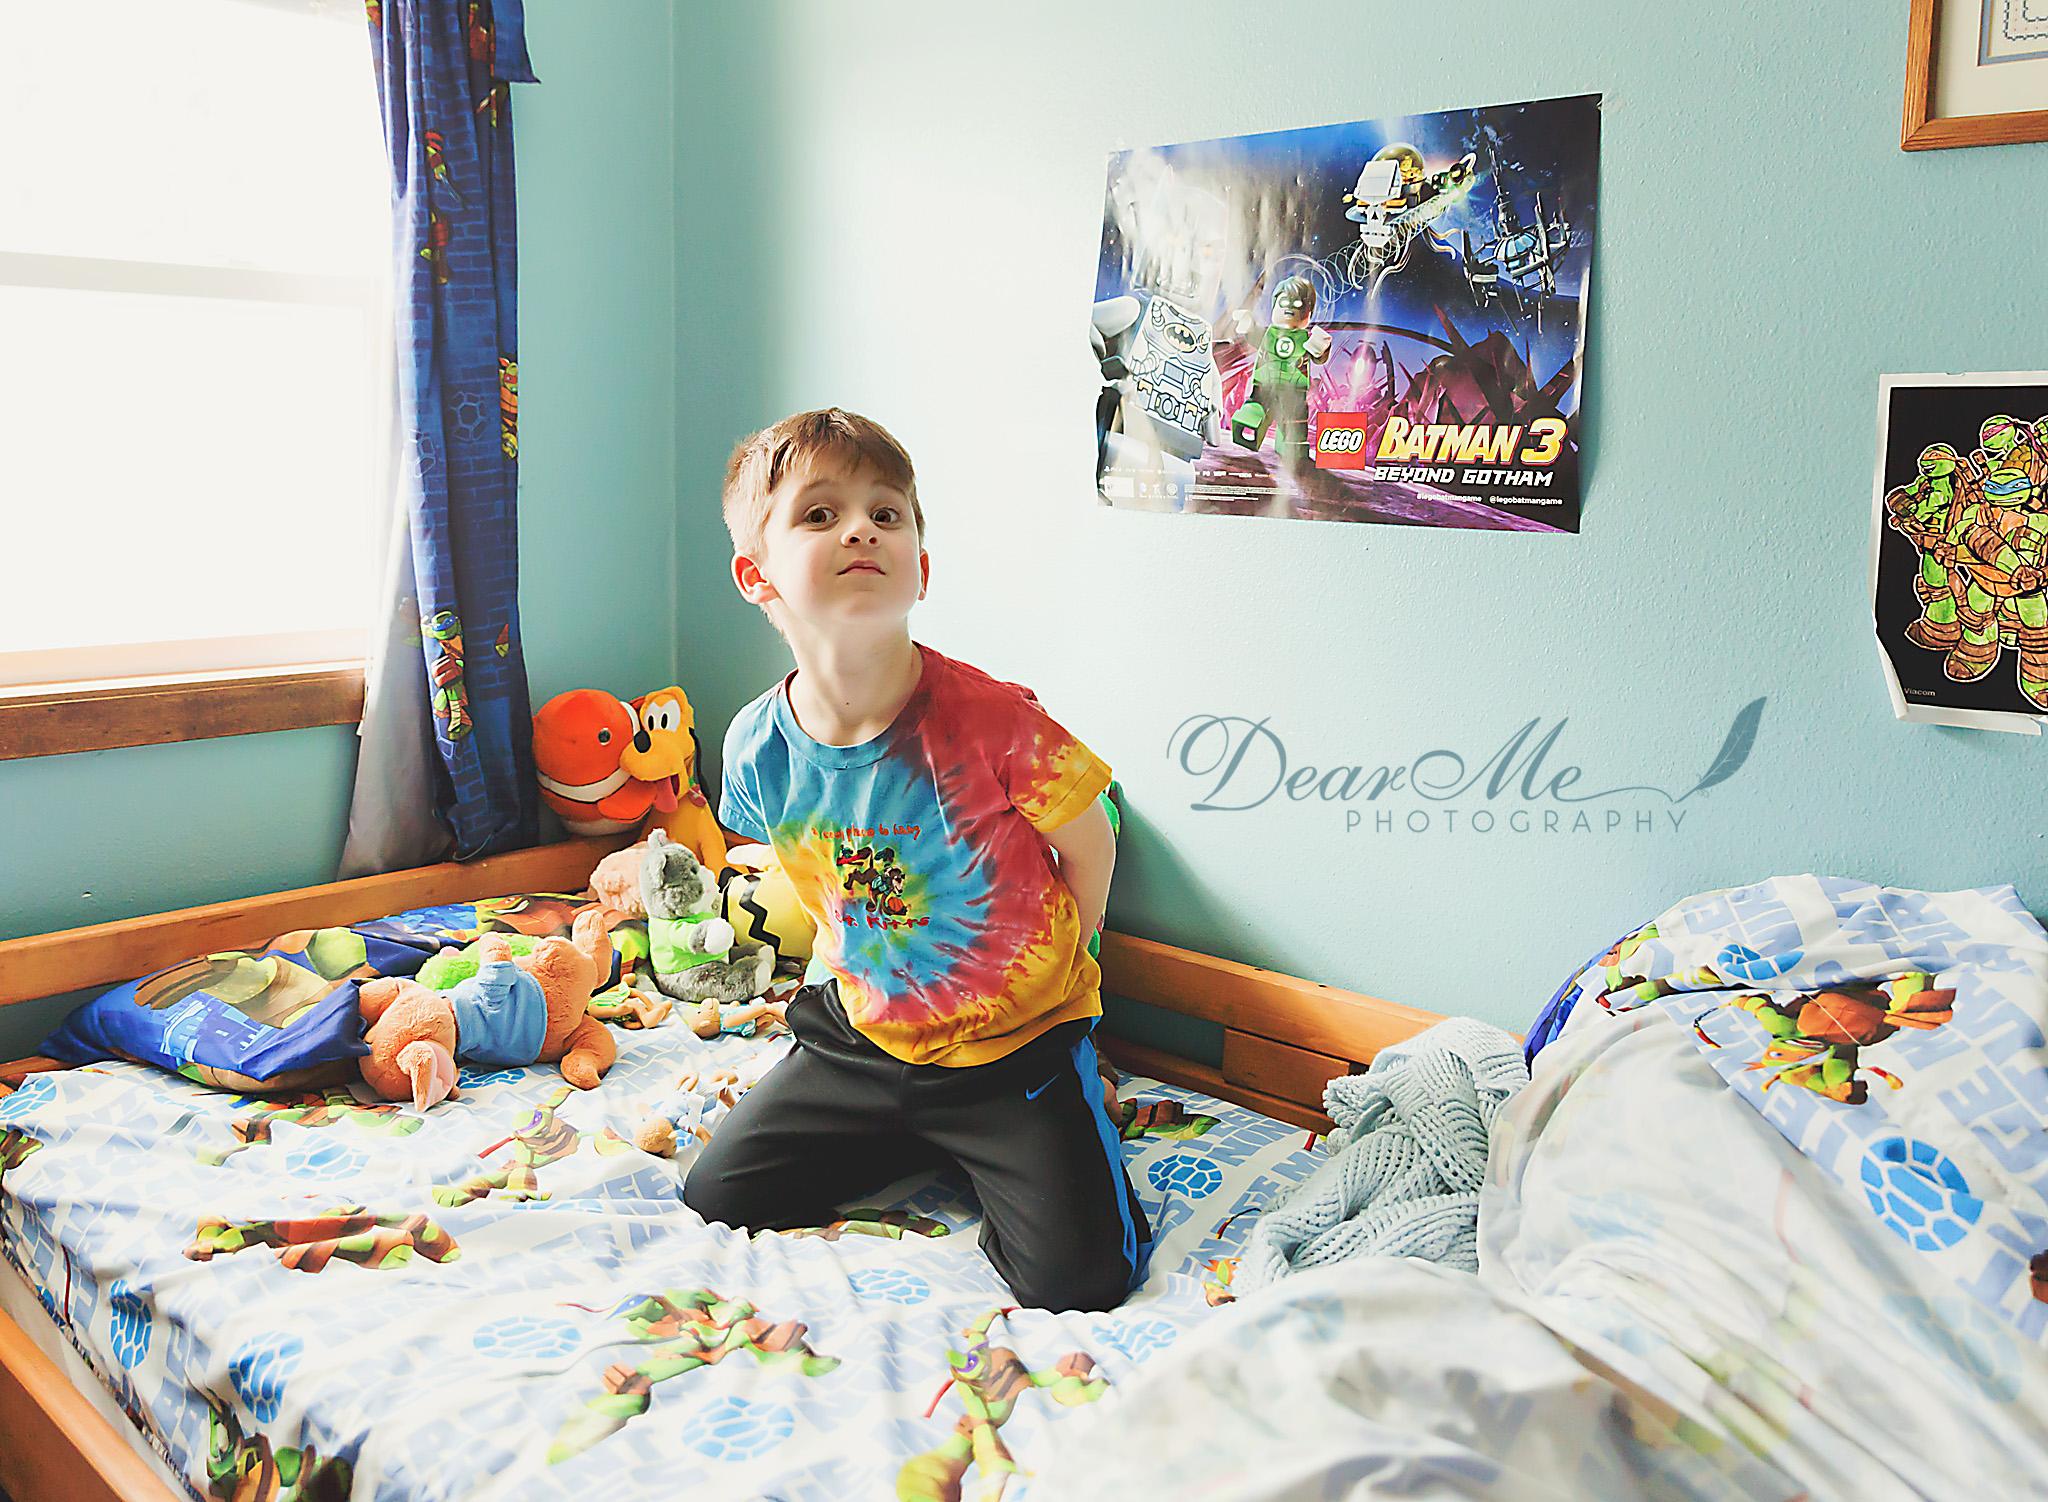 dear me photography bismarck faces of autism boy kneeling on bed